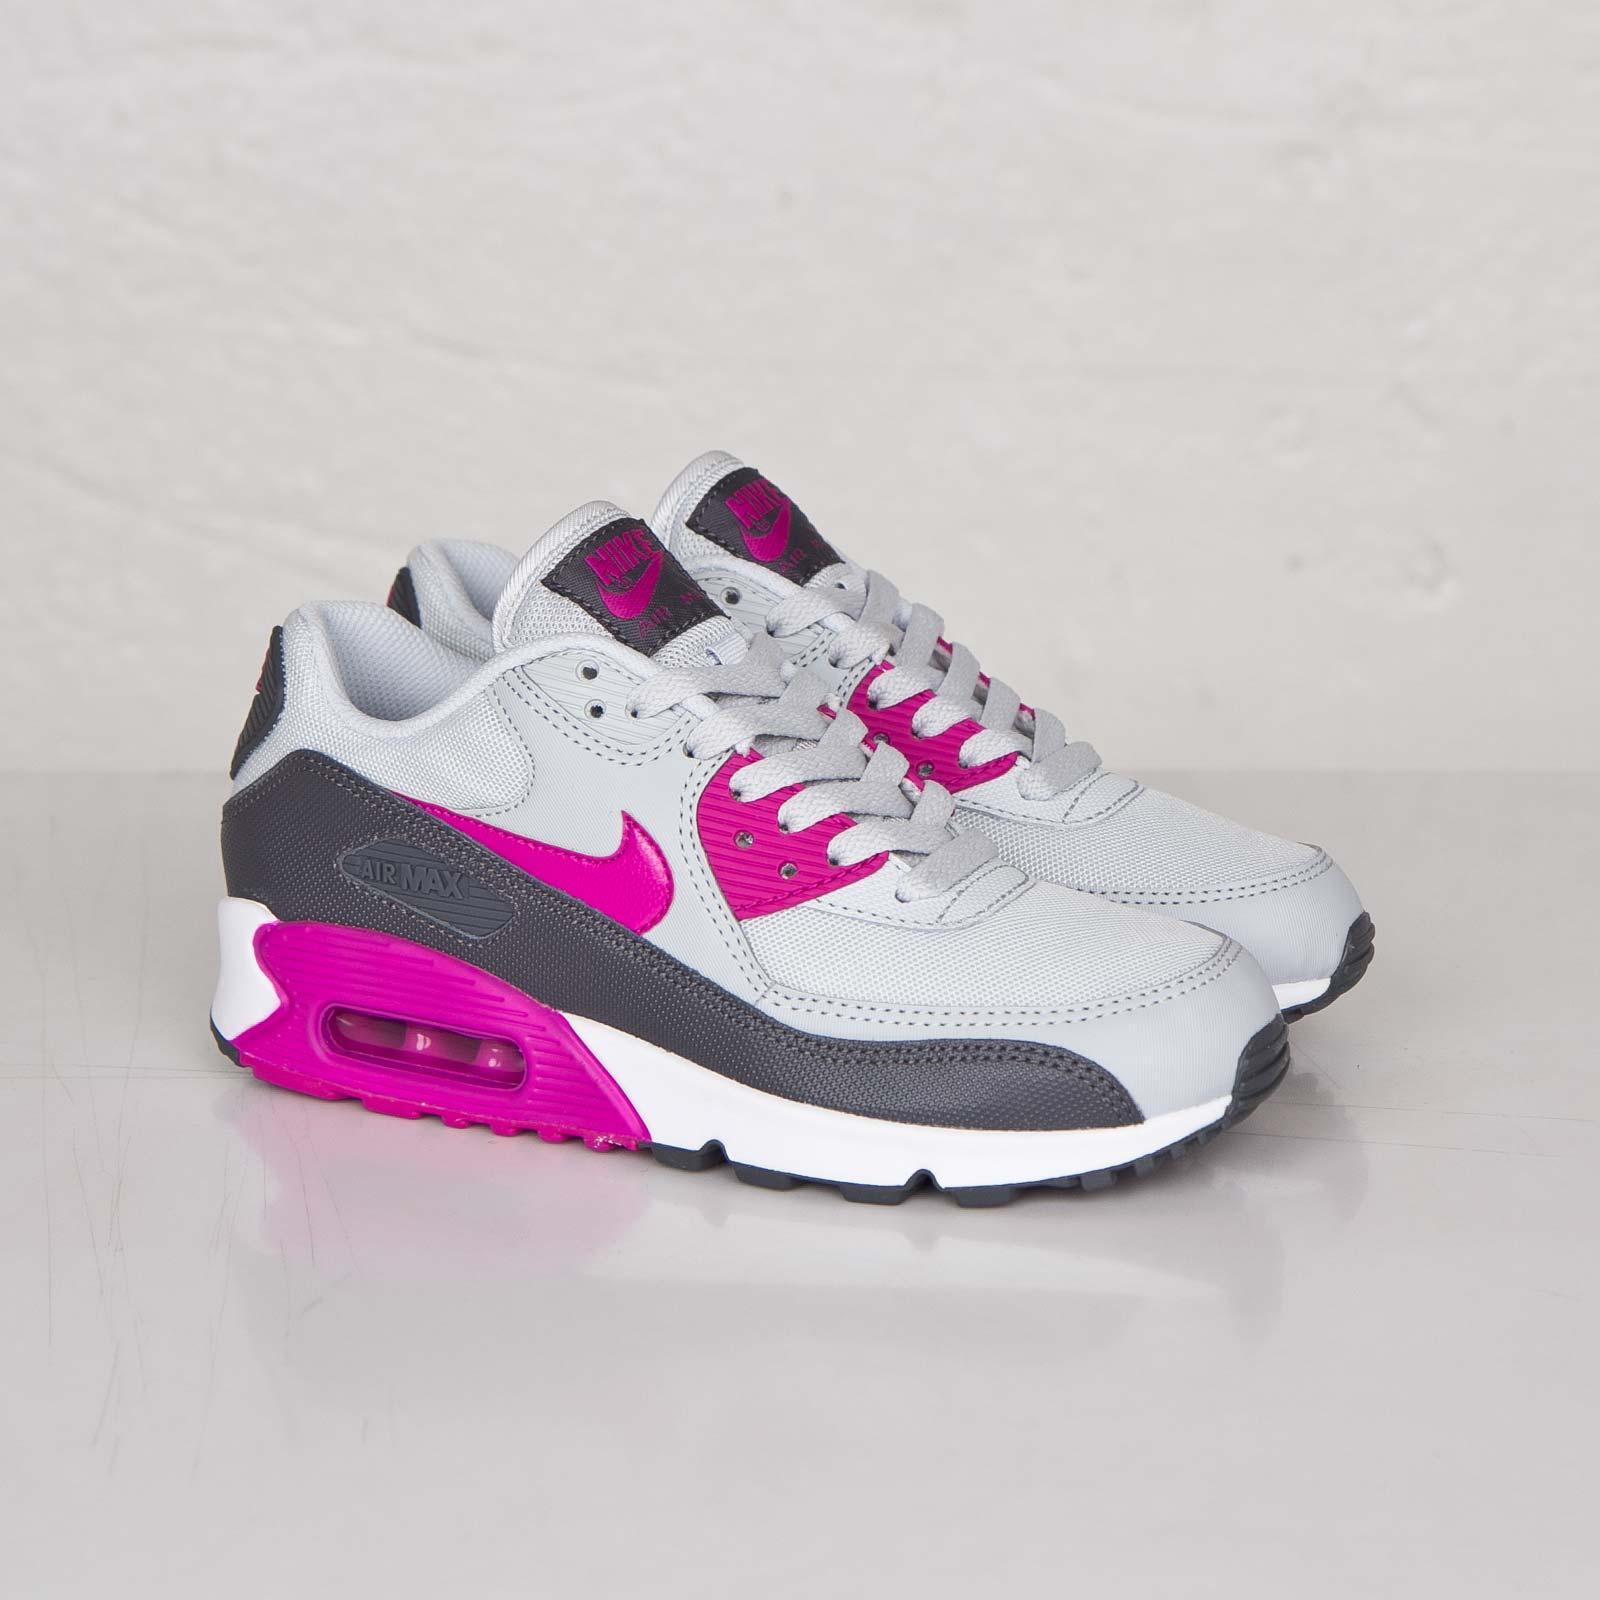 Nike Wmns Air Max 90 Essential 616730 013 Sneakersnstuff